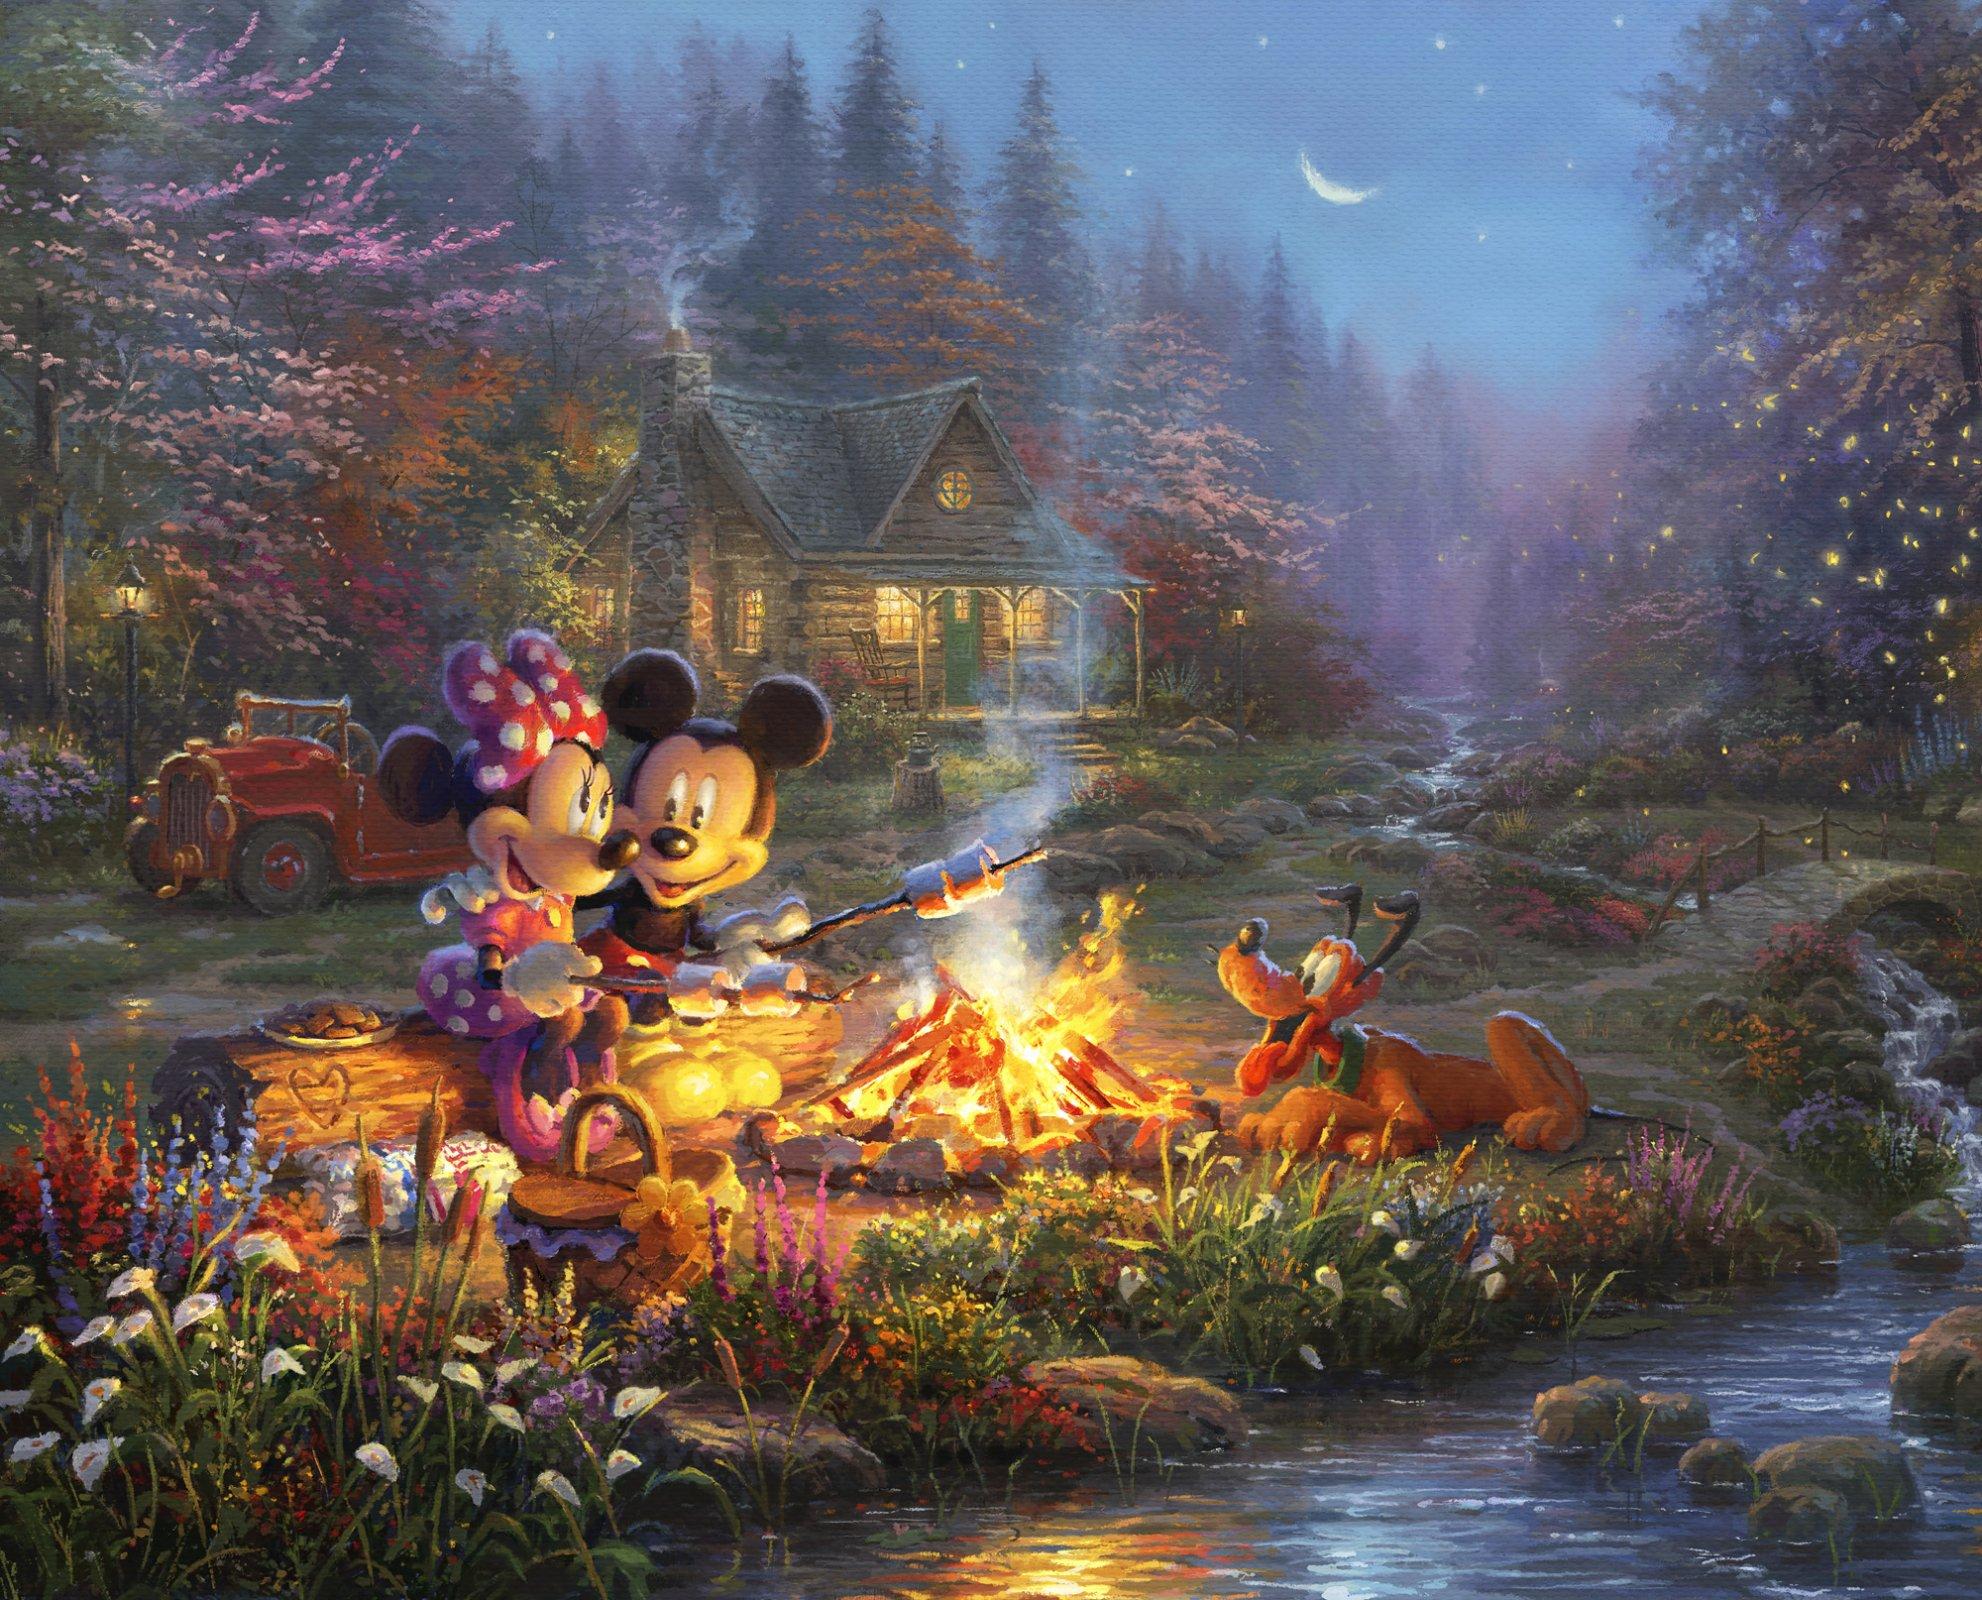 DT-Disney Dreams DS-2052-9C-1 Sweetheart Campfire Panel (35.5 x 44)